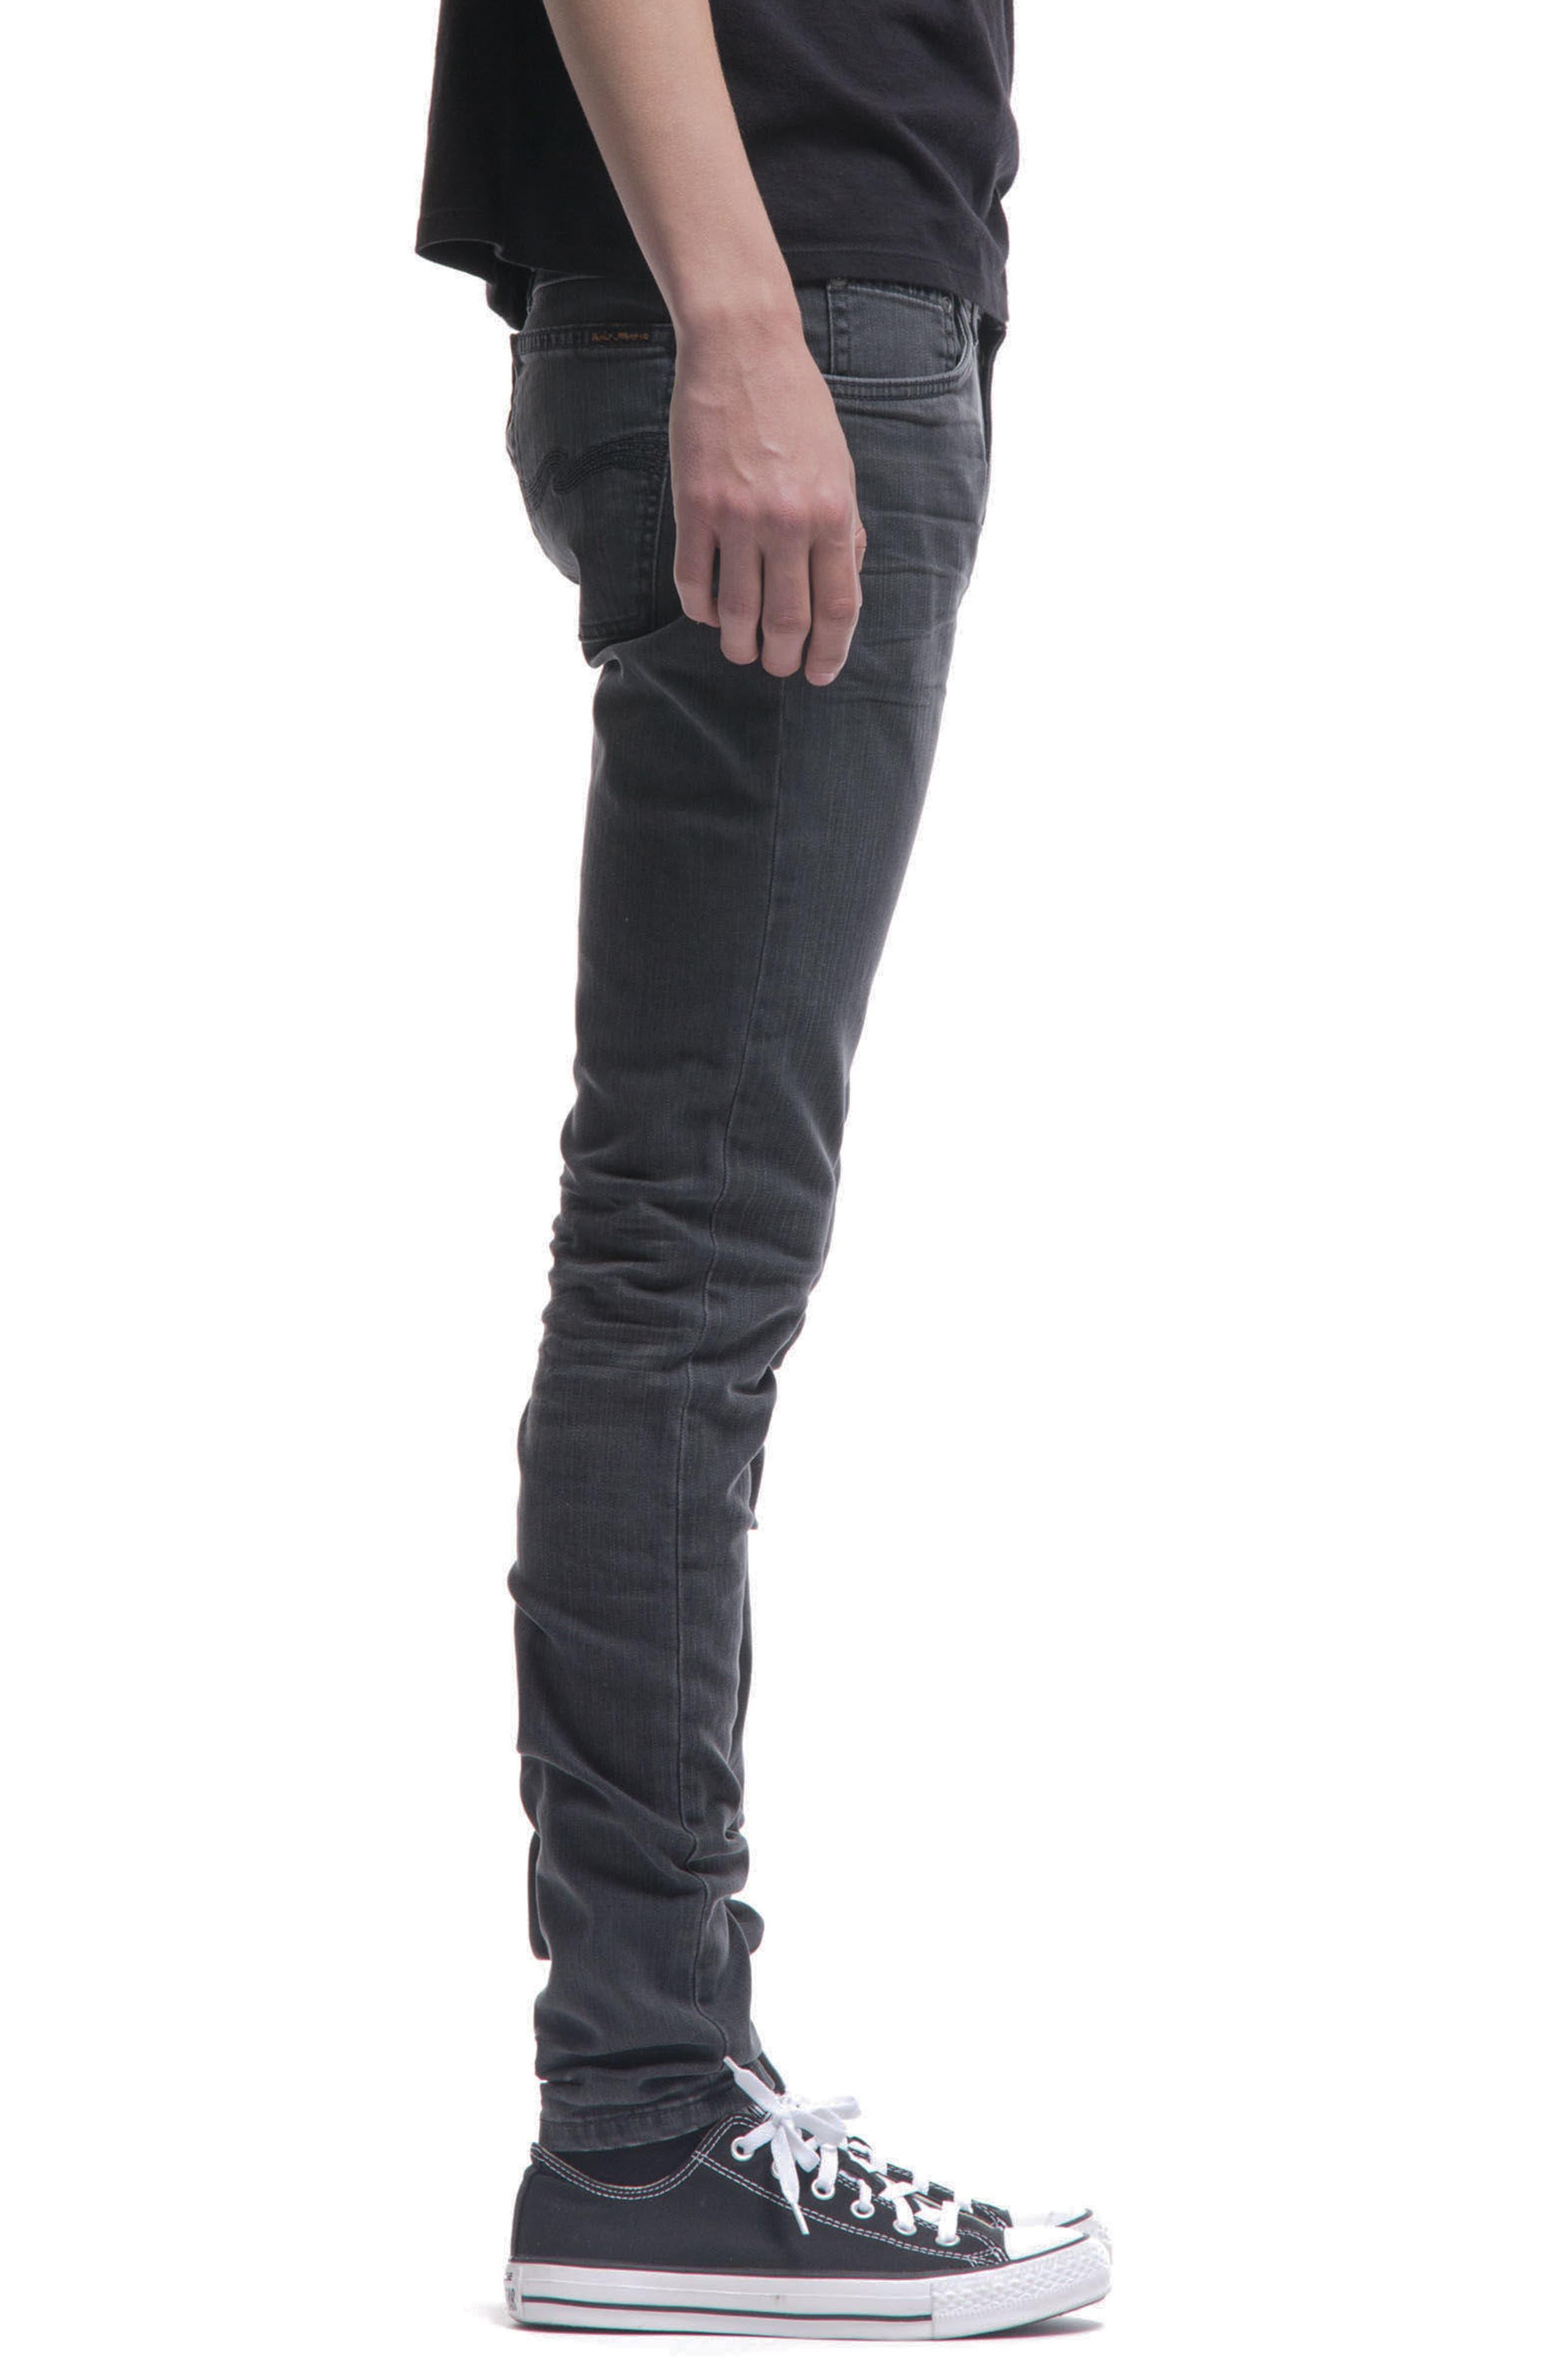 Skinny Lin Skinny Fit Jeans,                             Alternate thumbnail 3, color,                             Black Seas